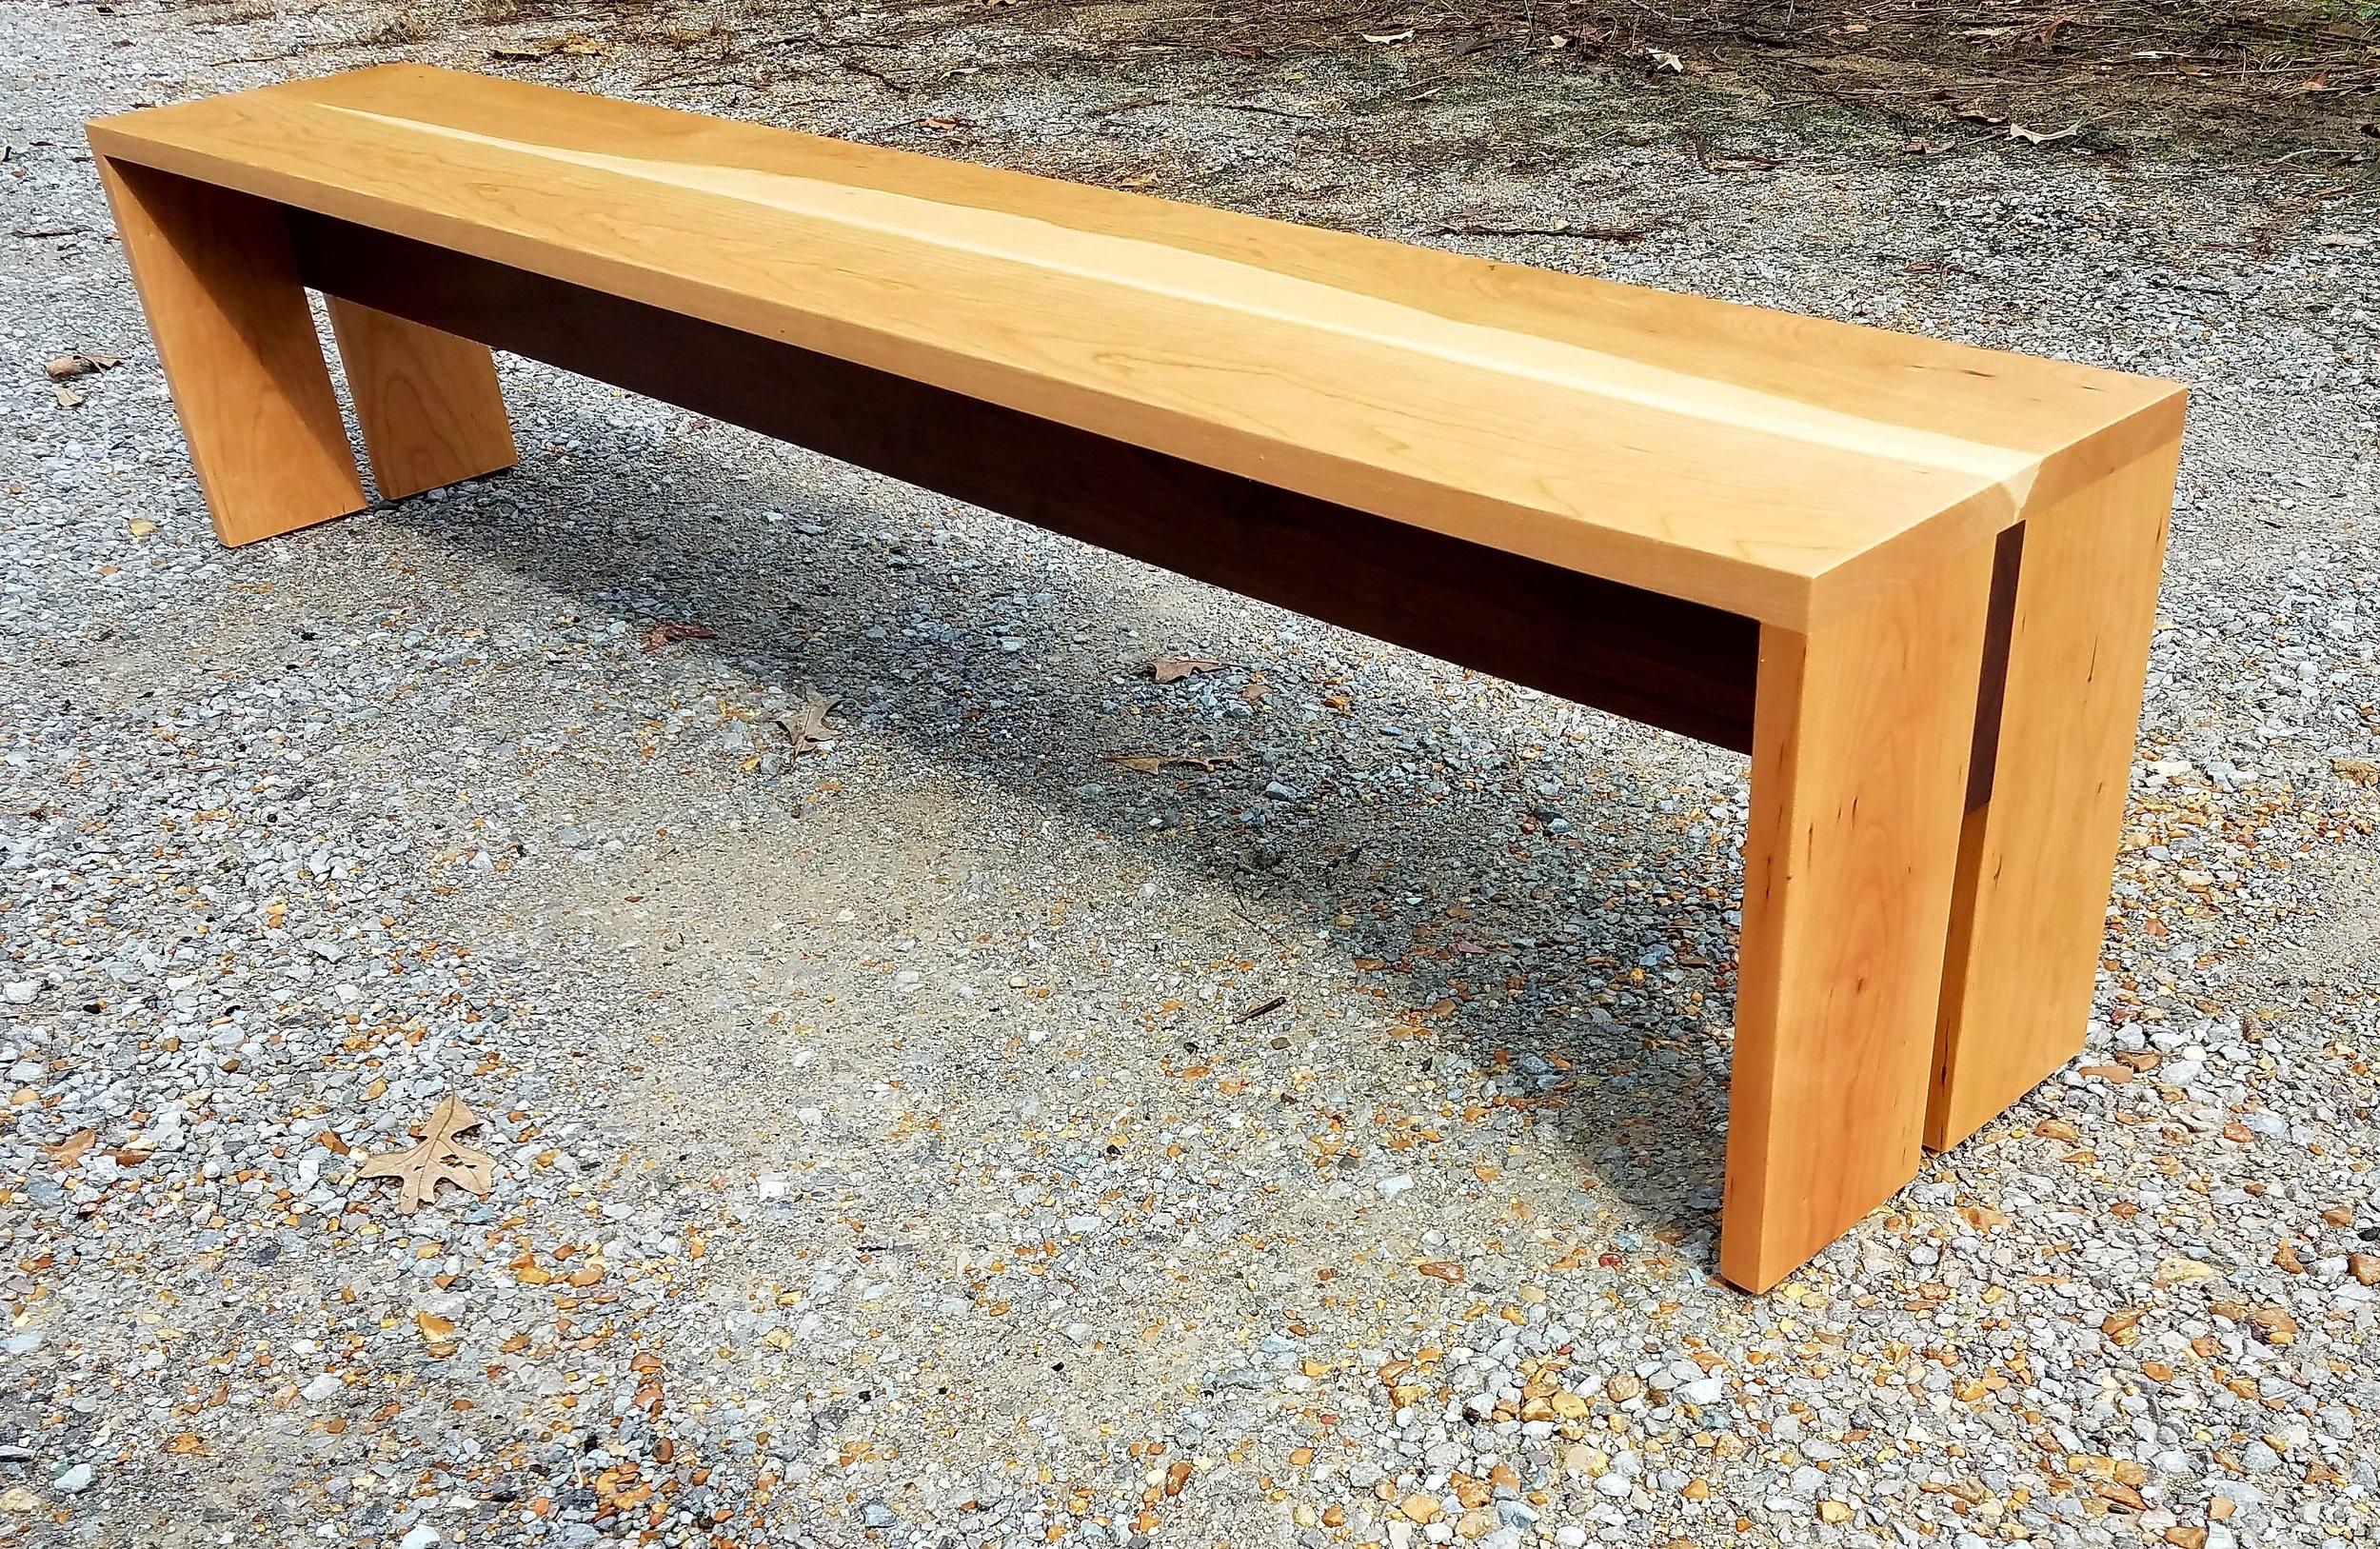 Copy of Solid Cherry Bench with Black Walnut Stretcher